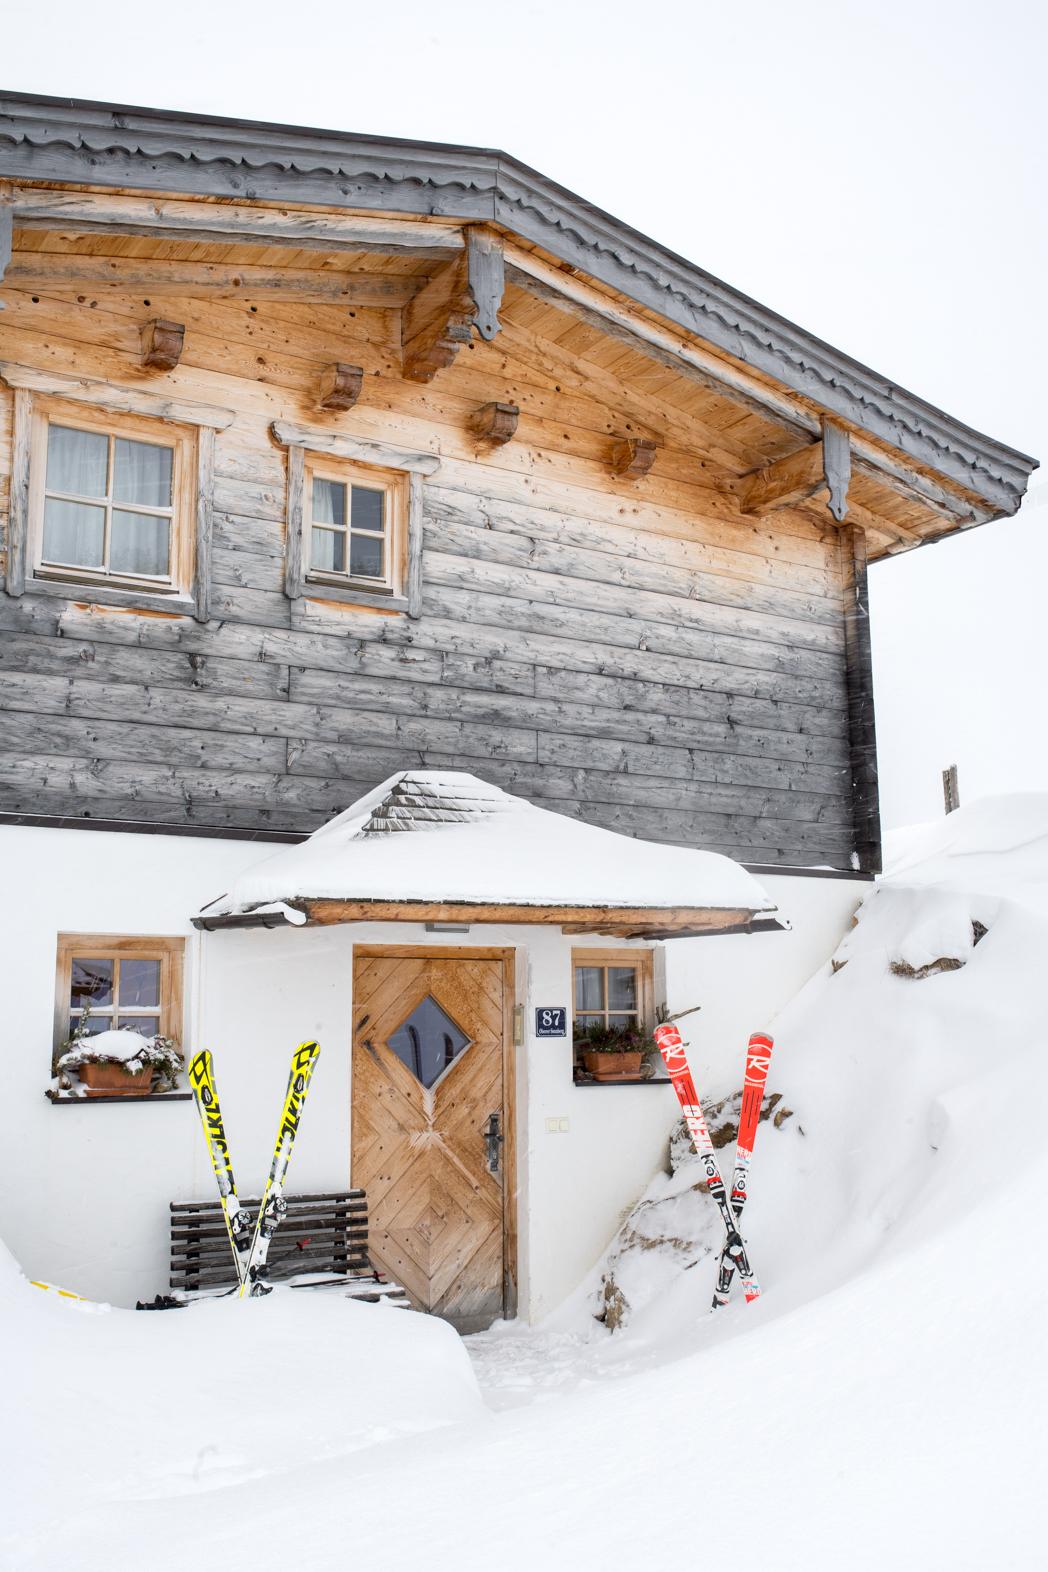 Stacie Flinner Christmas Ski Kitzbuhel Austria -75.jpg